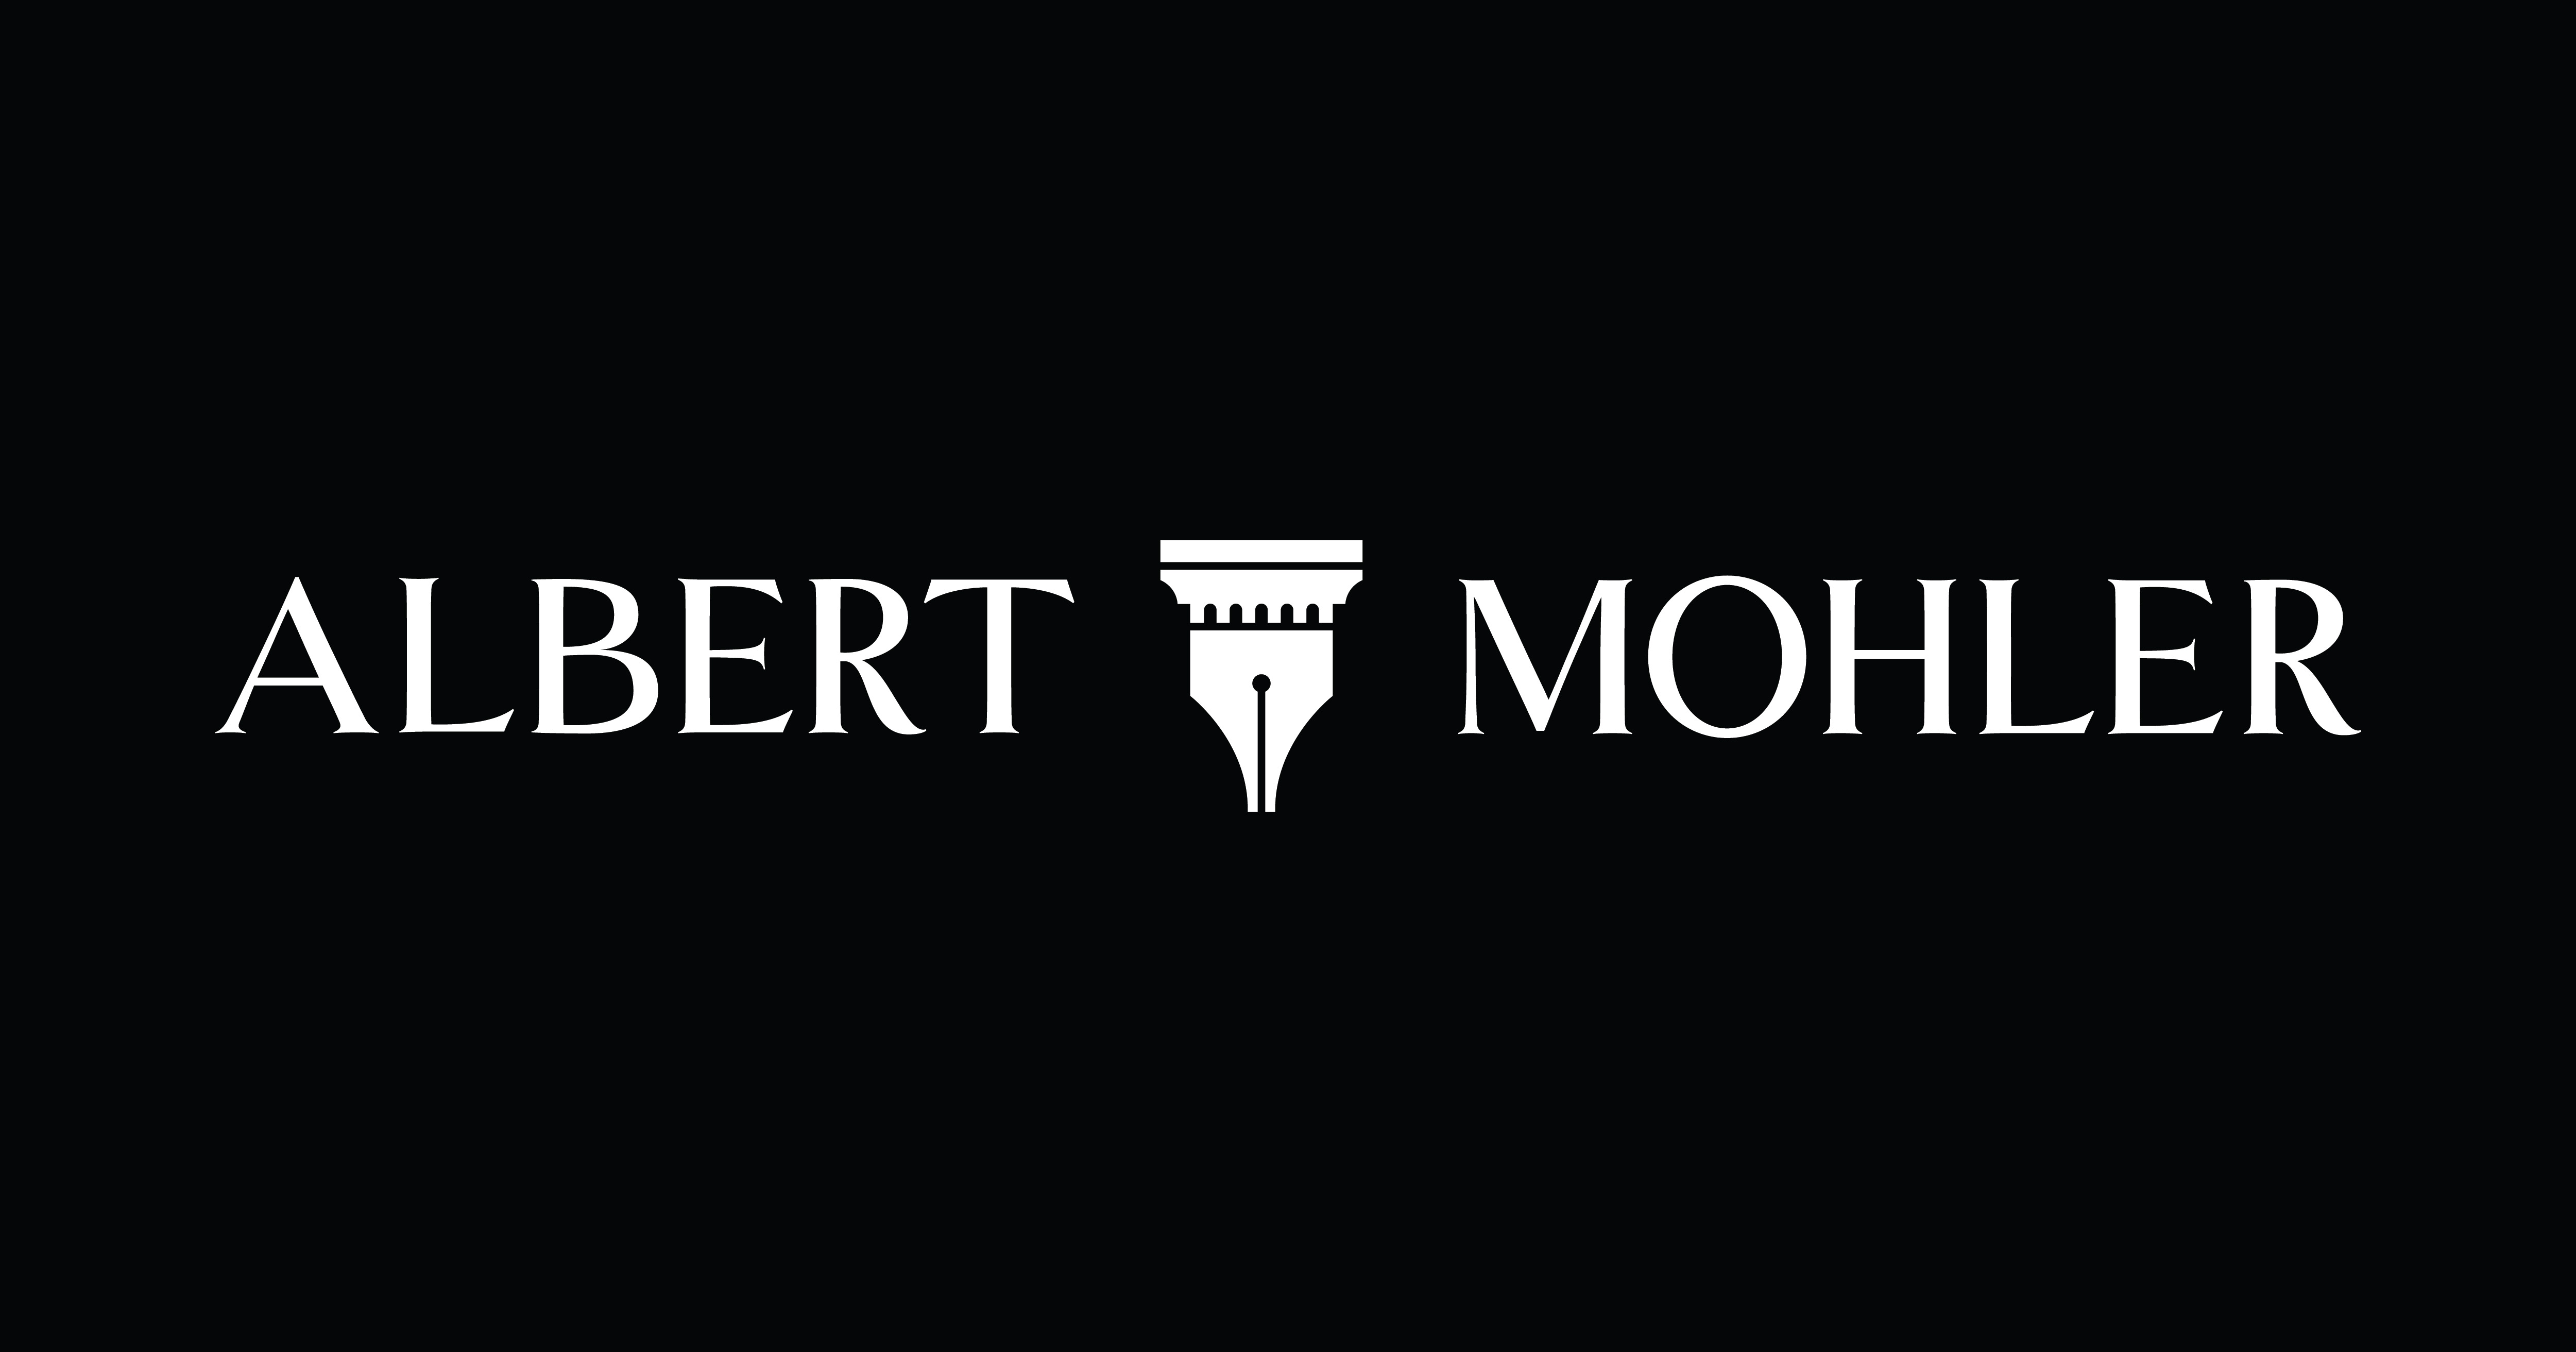 albertmohler.com